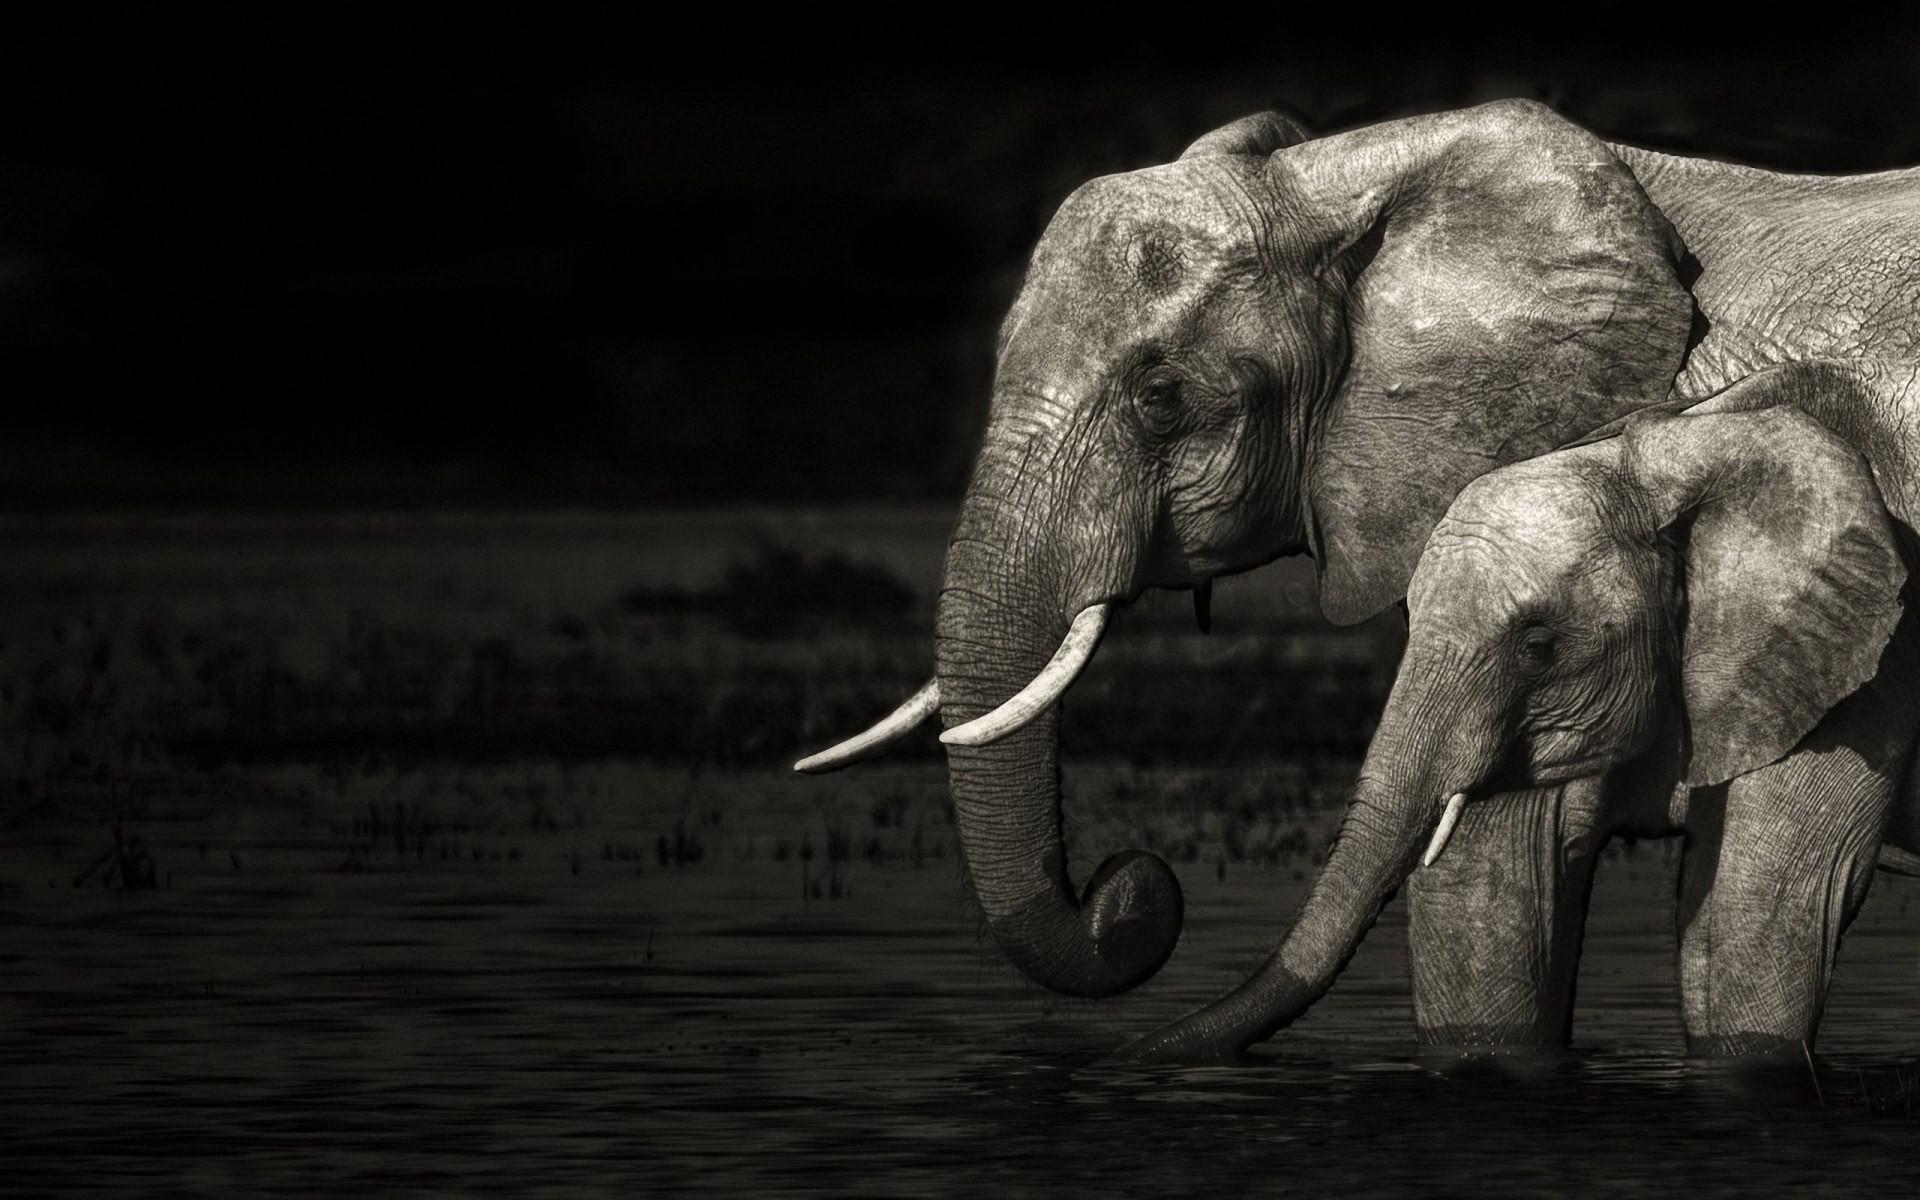 Tribal Elephant Wallpaper (59+ images)